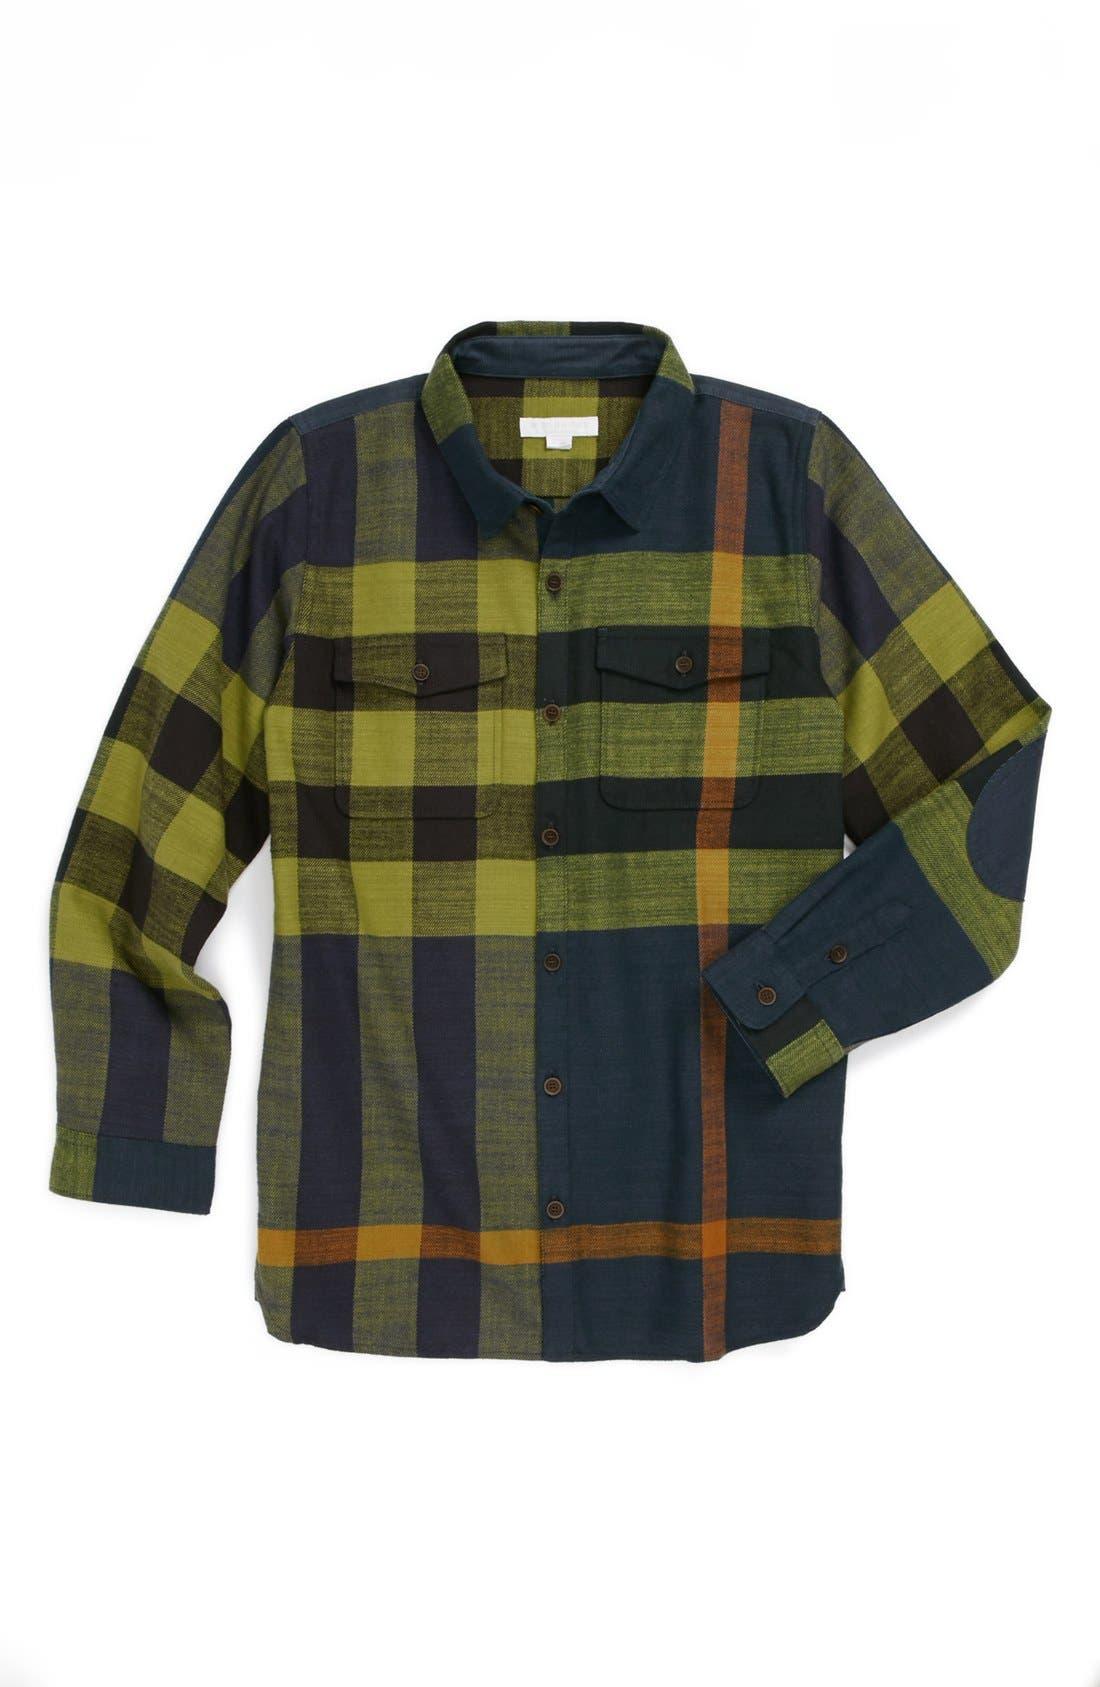 Main Image - Burberry 'Endell' Flannel Shirt (Little Boys & Big Boys)